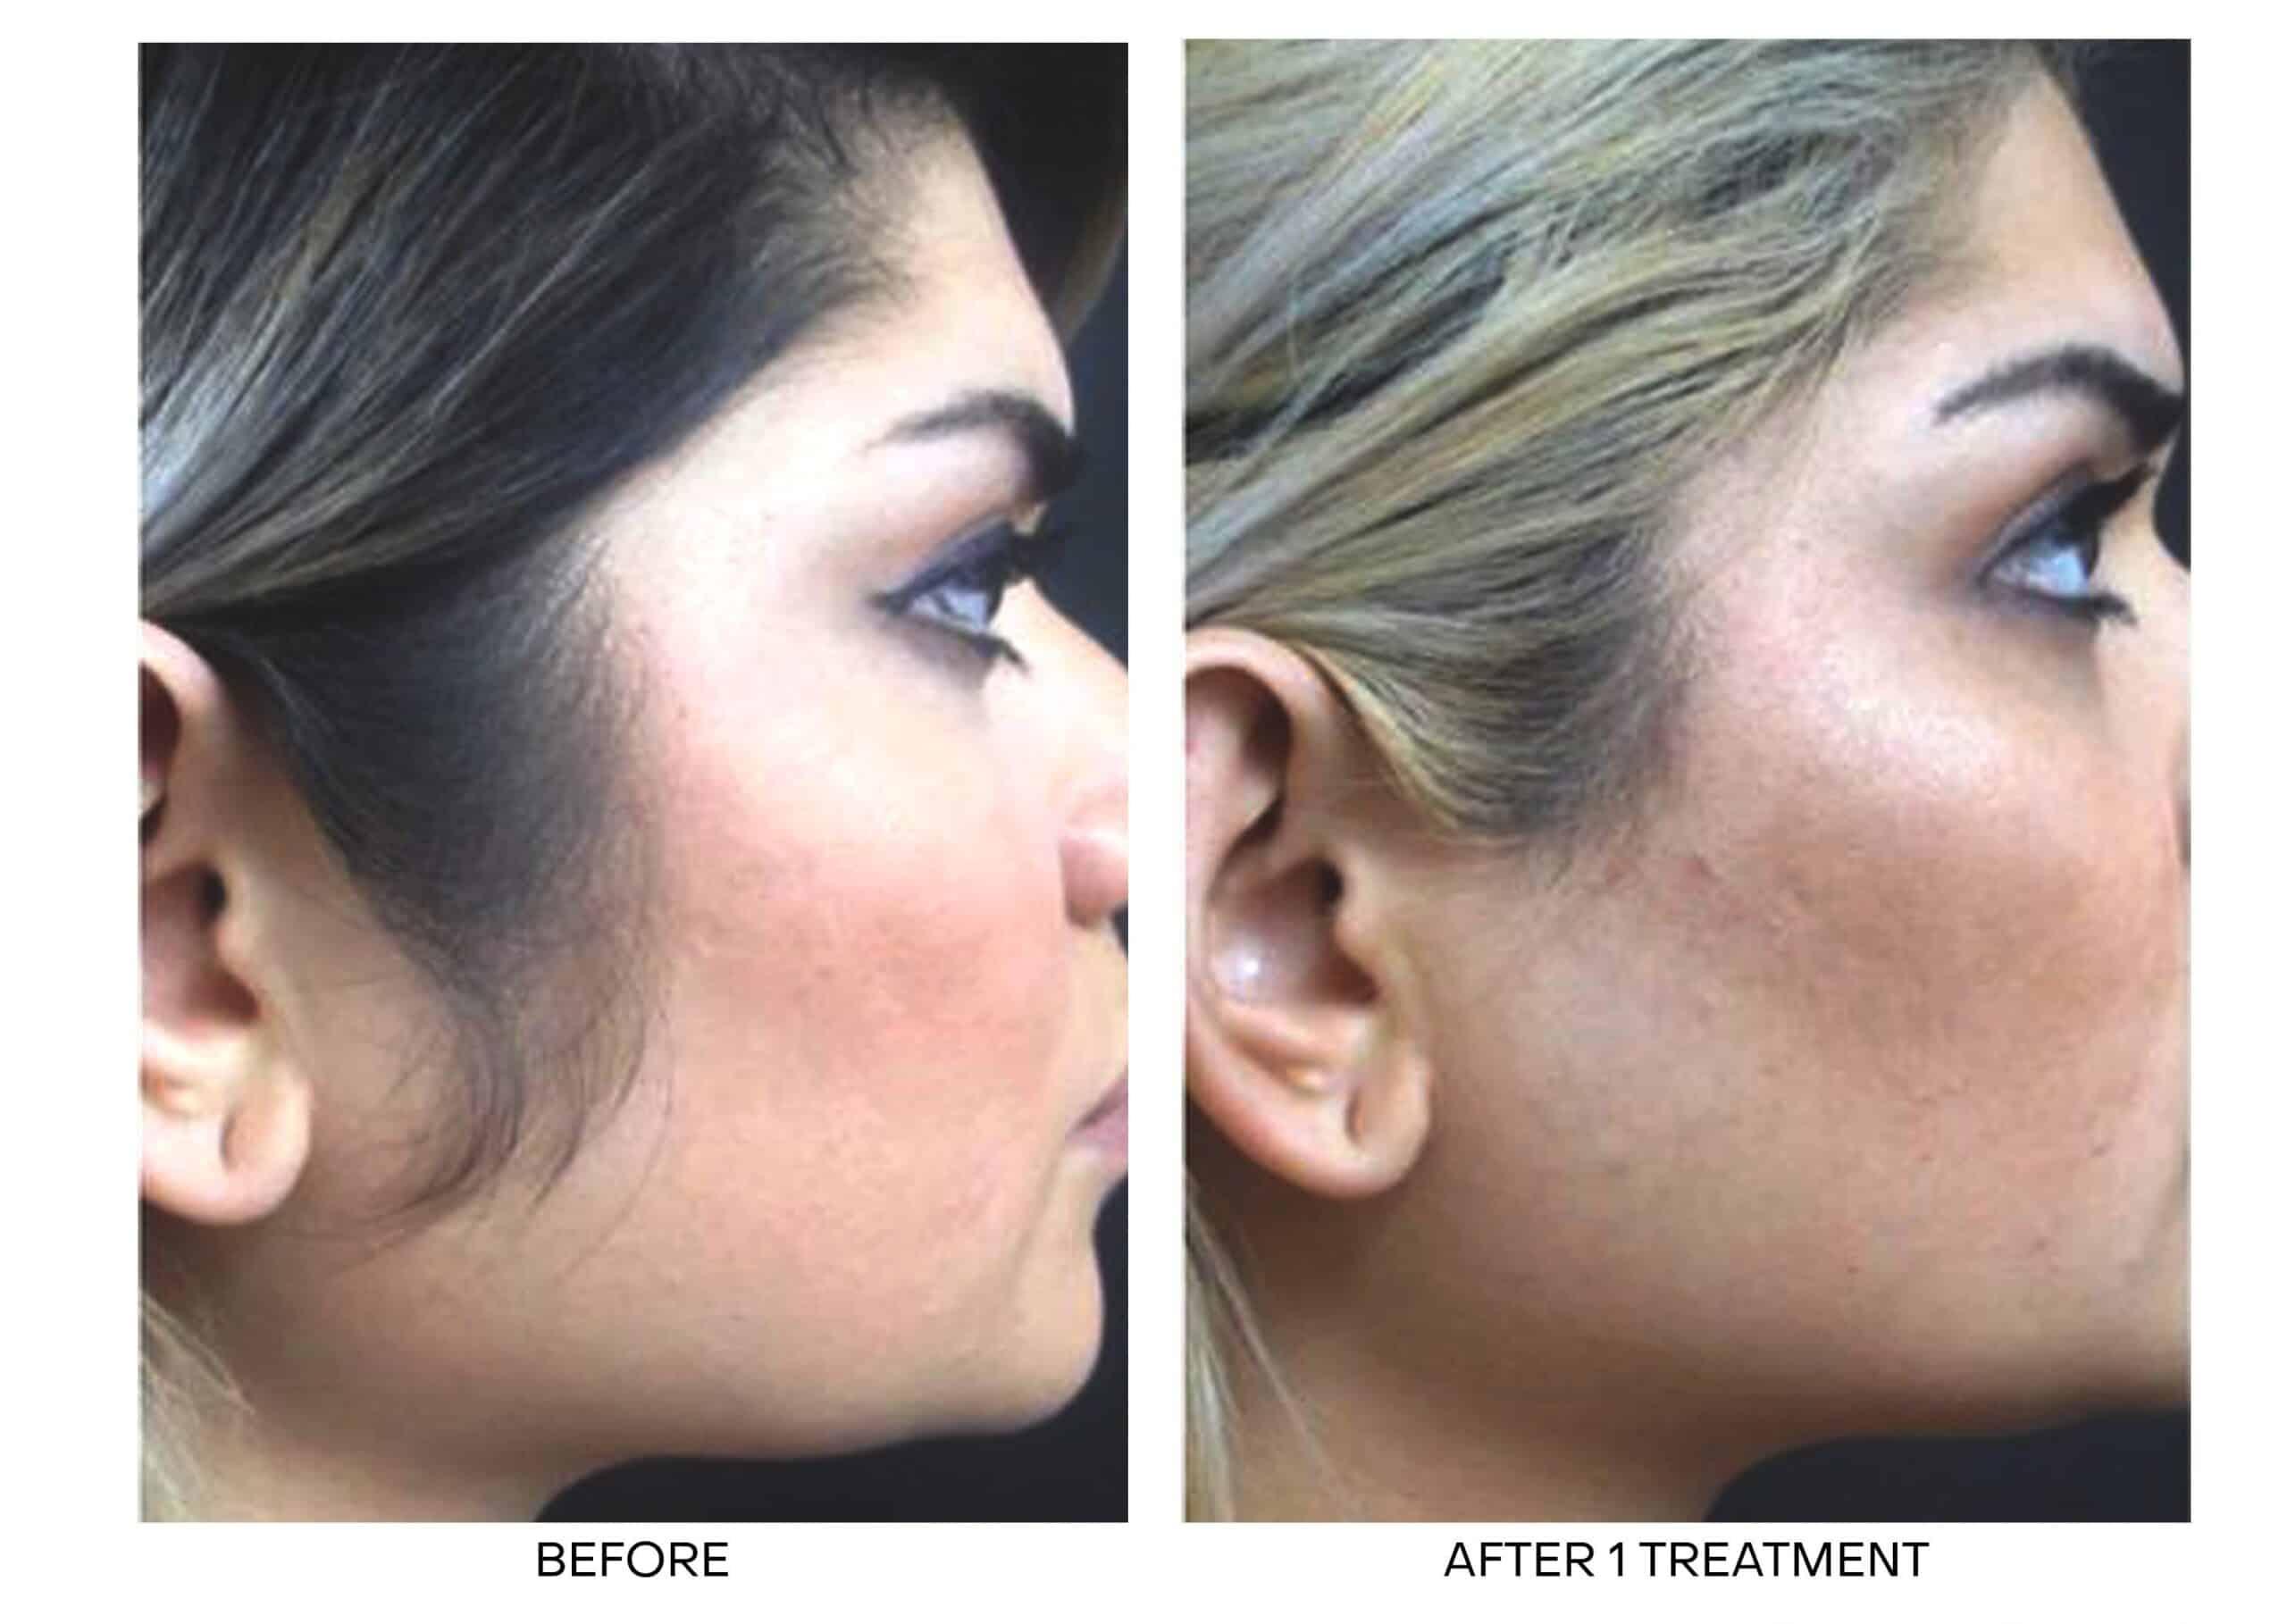 Laser Hair Removal for Sideburns